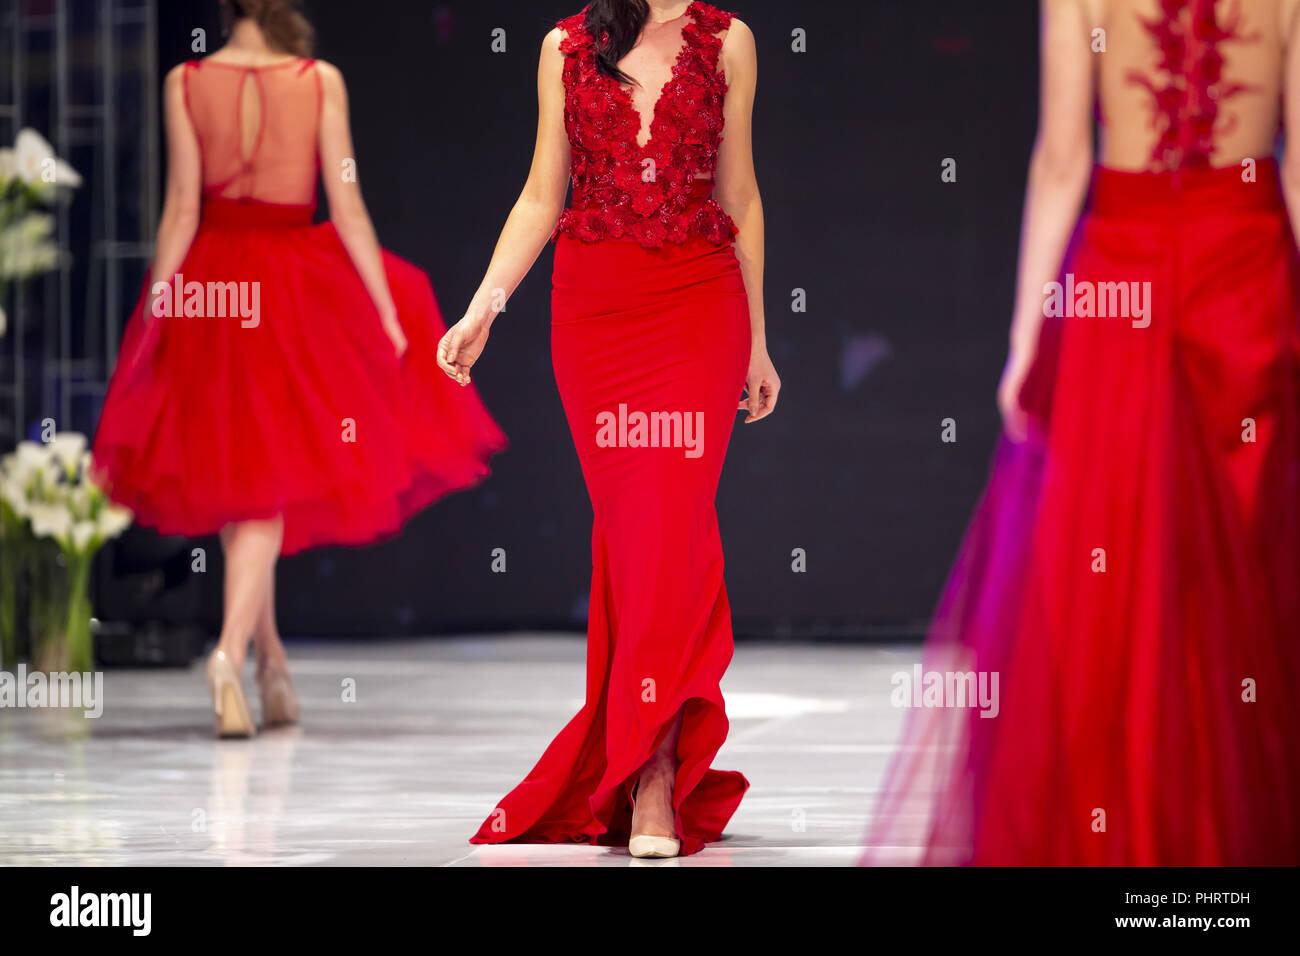 Fashion catwalk runway show models red dress - Stock Image